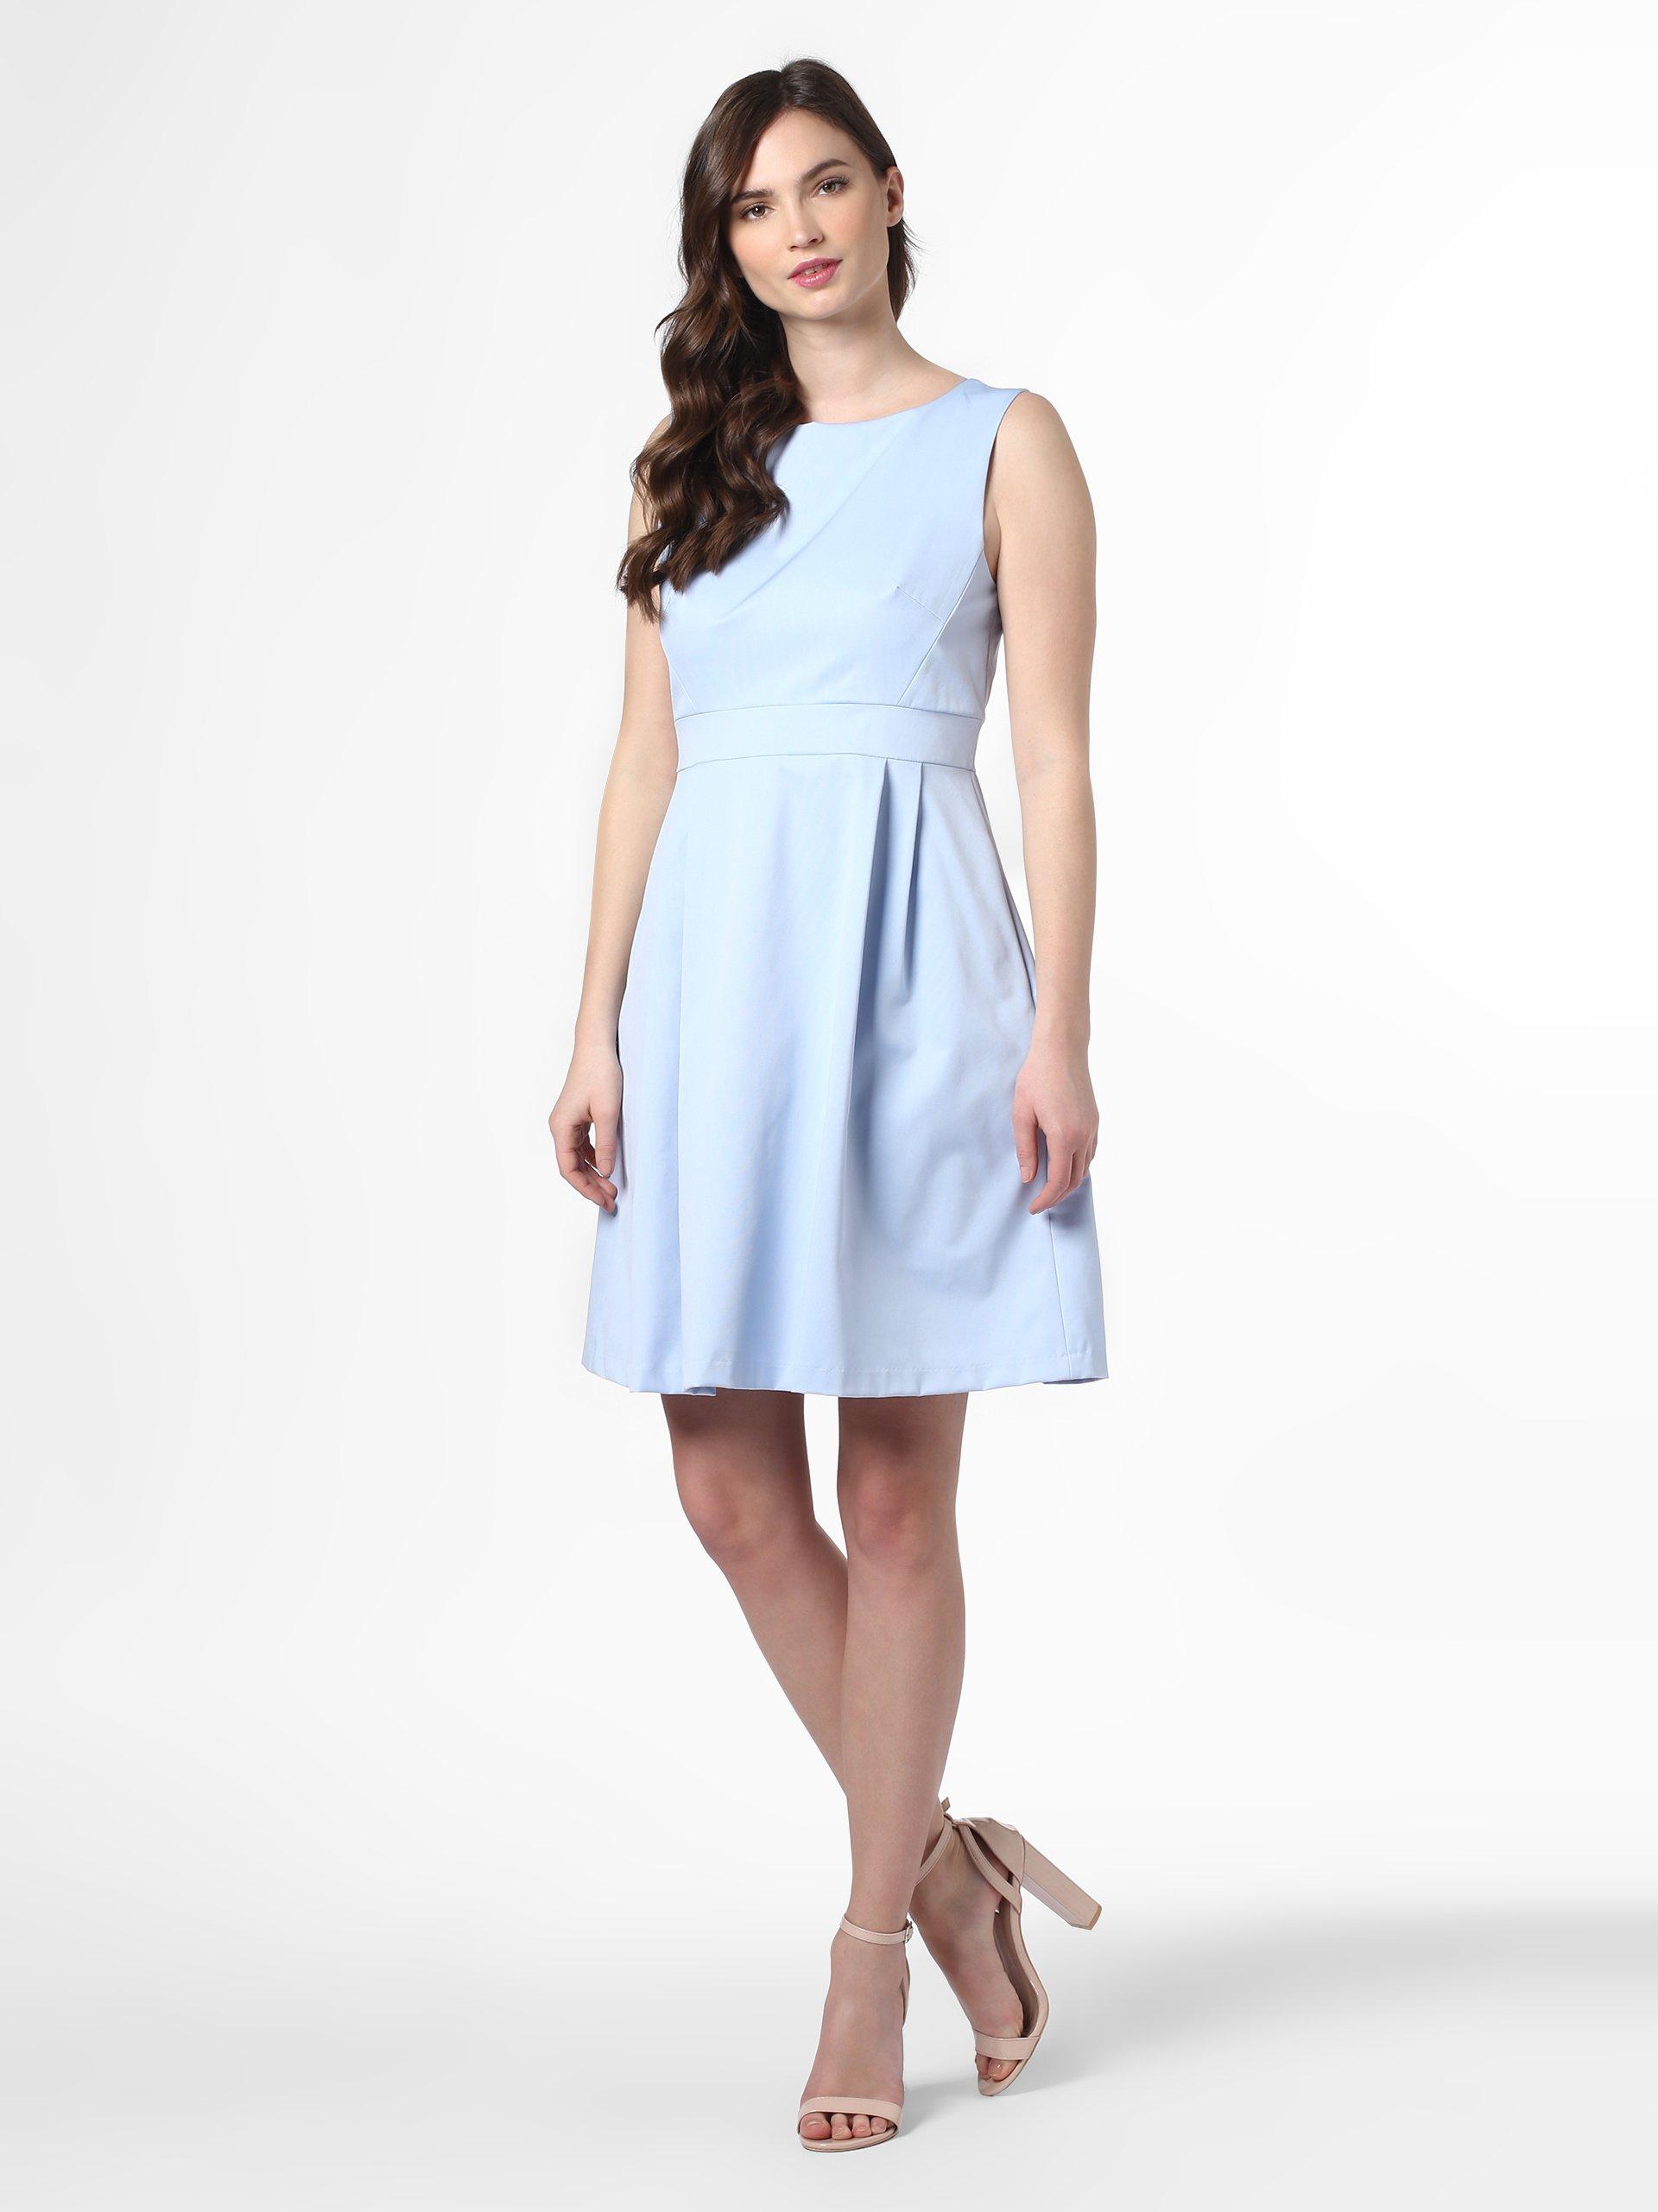 macys dresses